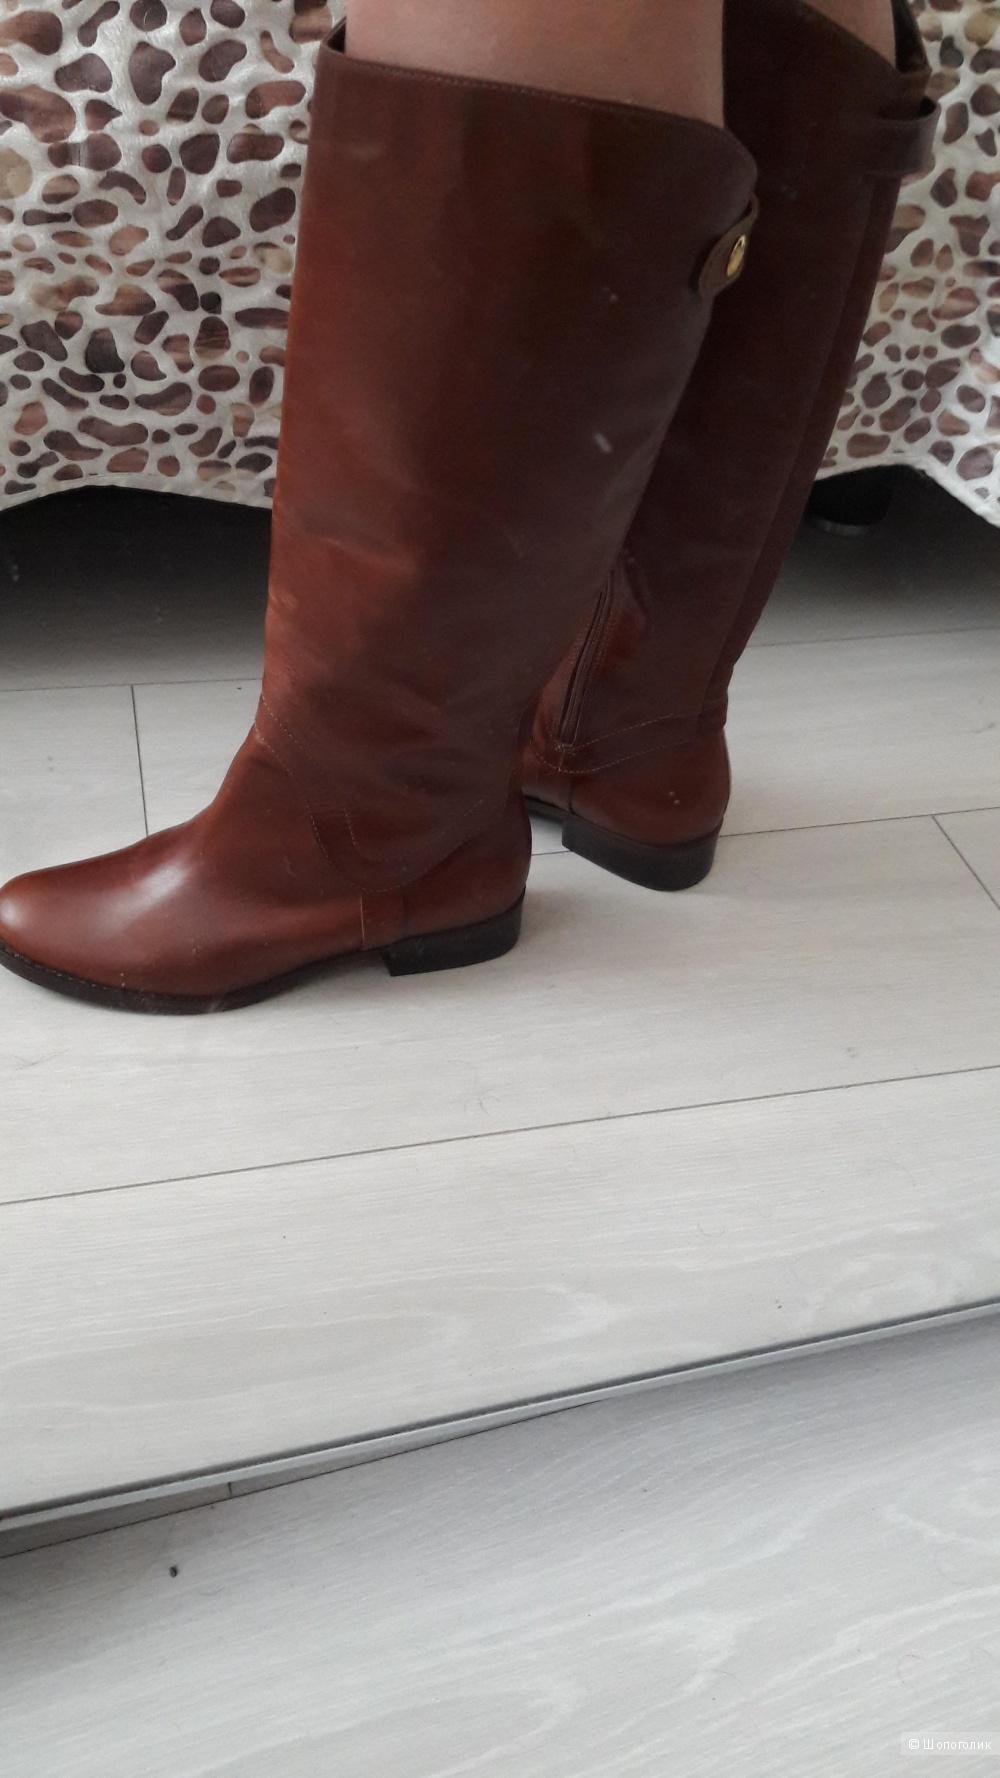 Жокейские сапоги Steven Steve Madden Sady W Round Toe Leather Knee High Boot